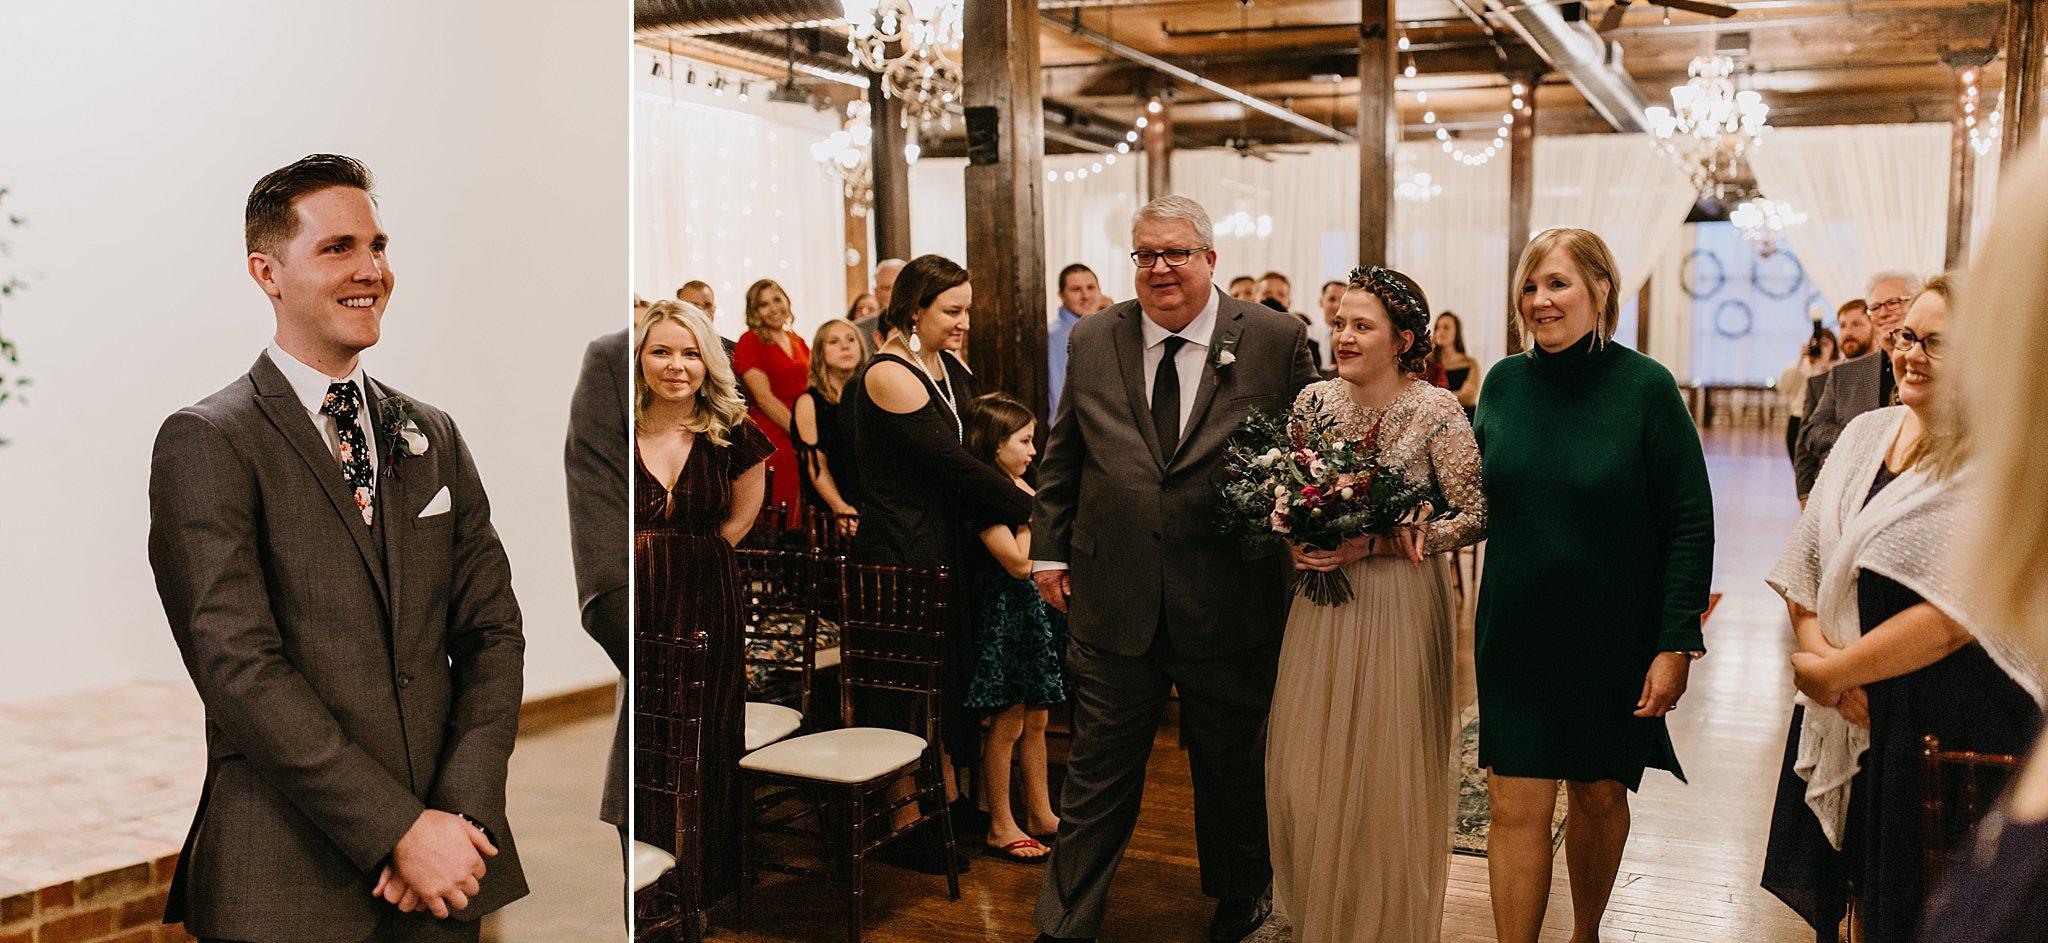 Wilderlove Co_Waco Texas_The Phoenix_Romantic Wedding Photography_0070.jpg